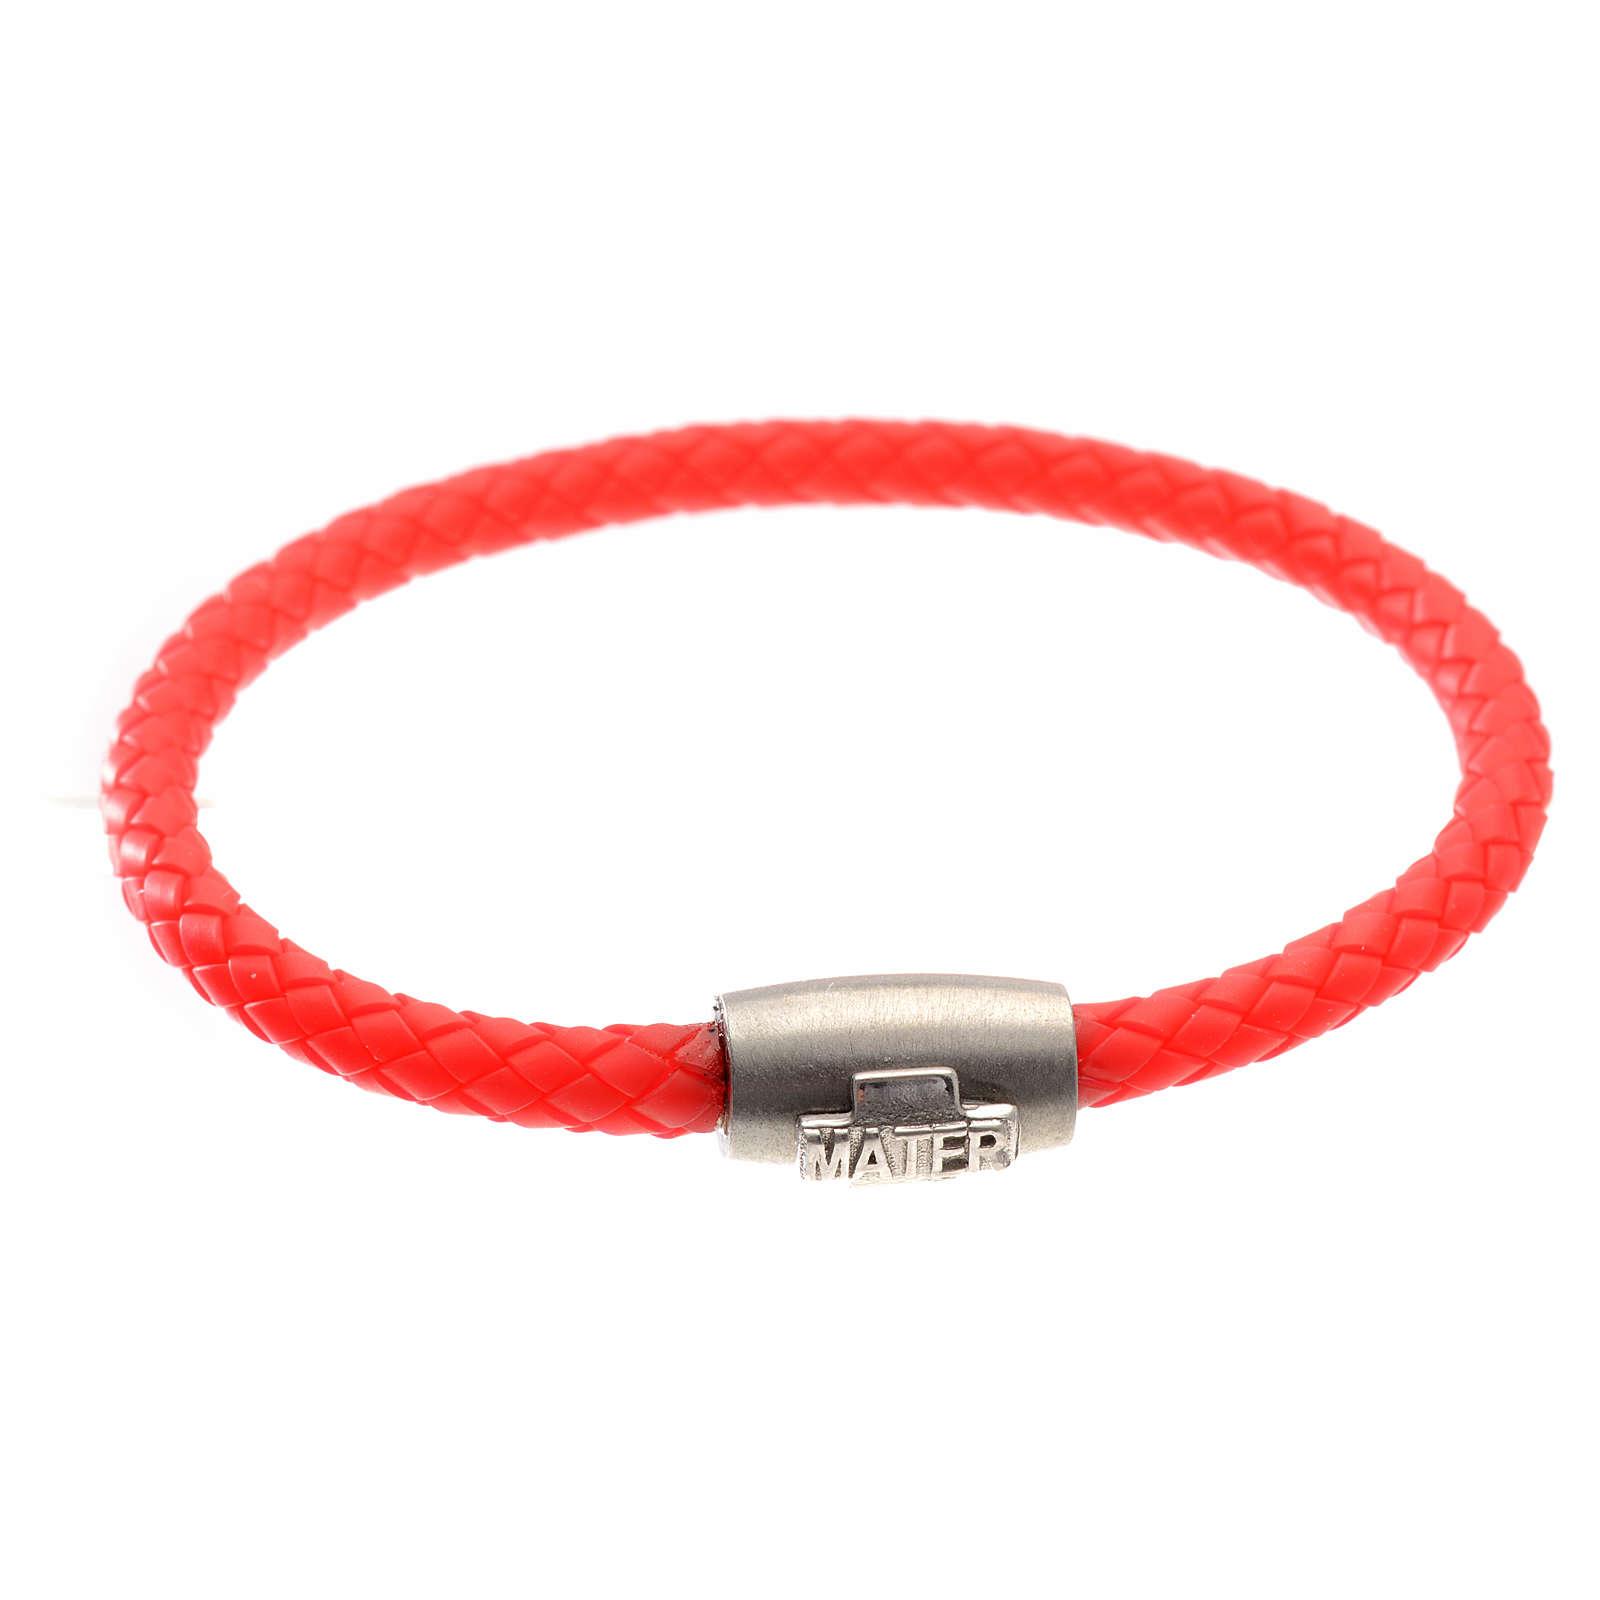 Bracciale MATER rosso croce argento 925 4